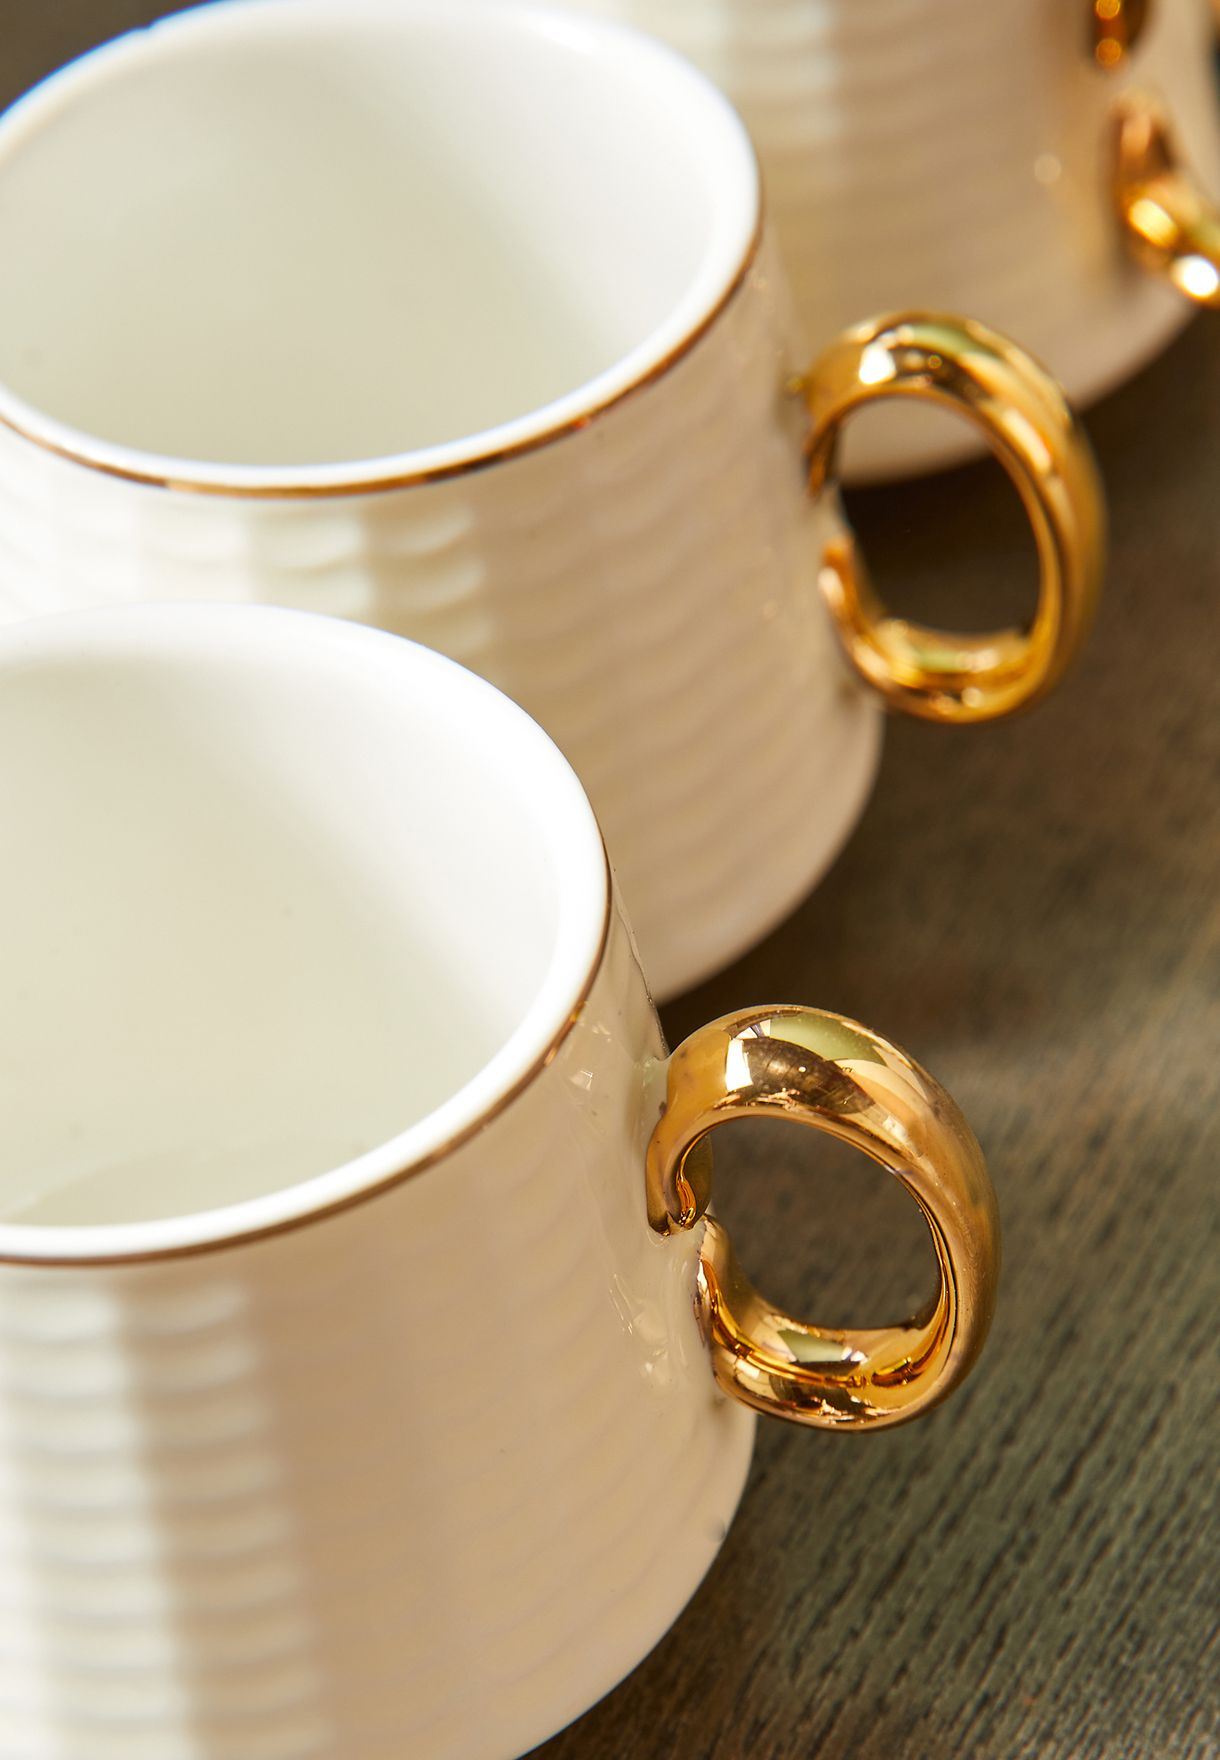 طقم اكواب شاي مع صحون 6 قطع